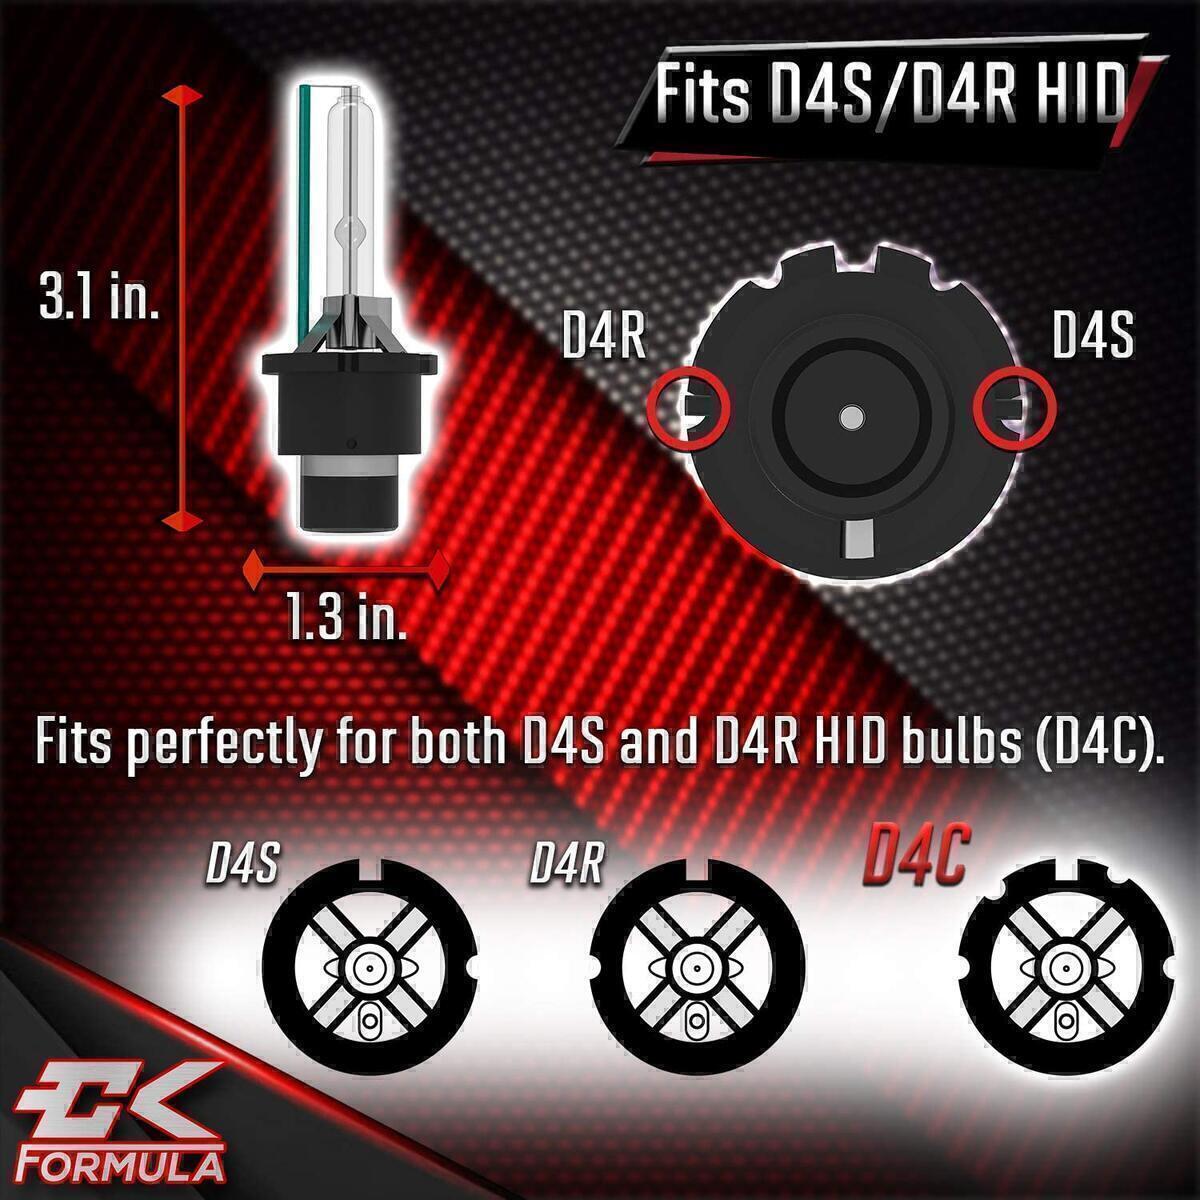 CK Formula D4C/D4R/D4S HID Headlight Bulb - 6000K Super White, 12V 35W, Xenon for Direct Factory Automotive OEM Head Light Replacement IP68 Waterproof (Set of 2)